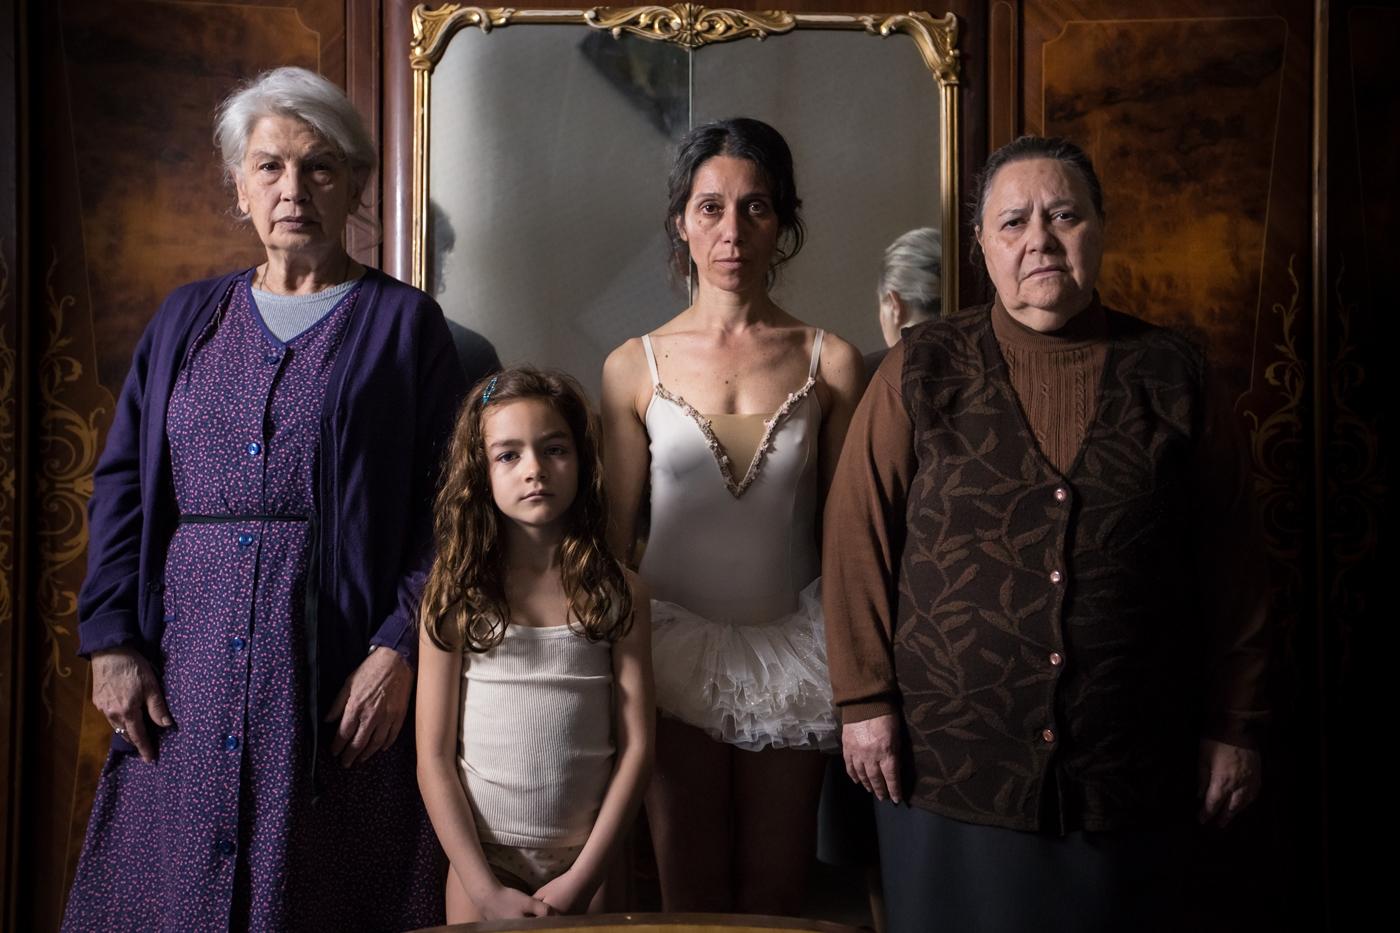 Le sorelle Macaluso, 2020 - Emma Dante